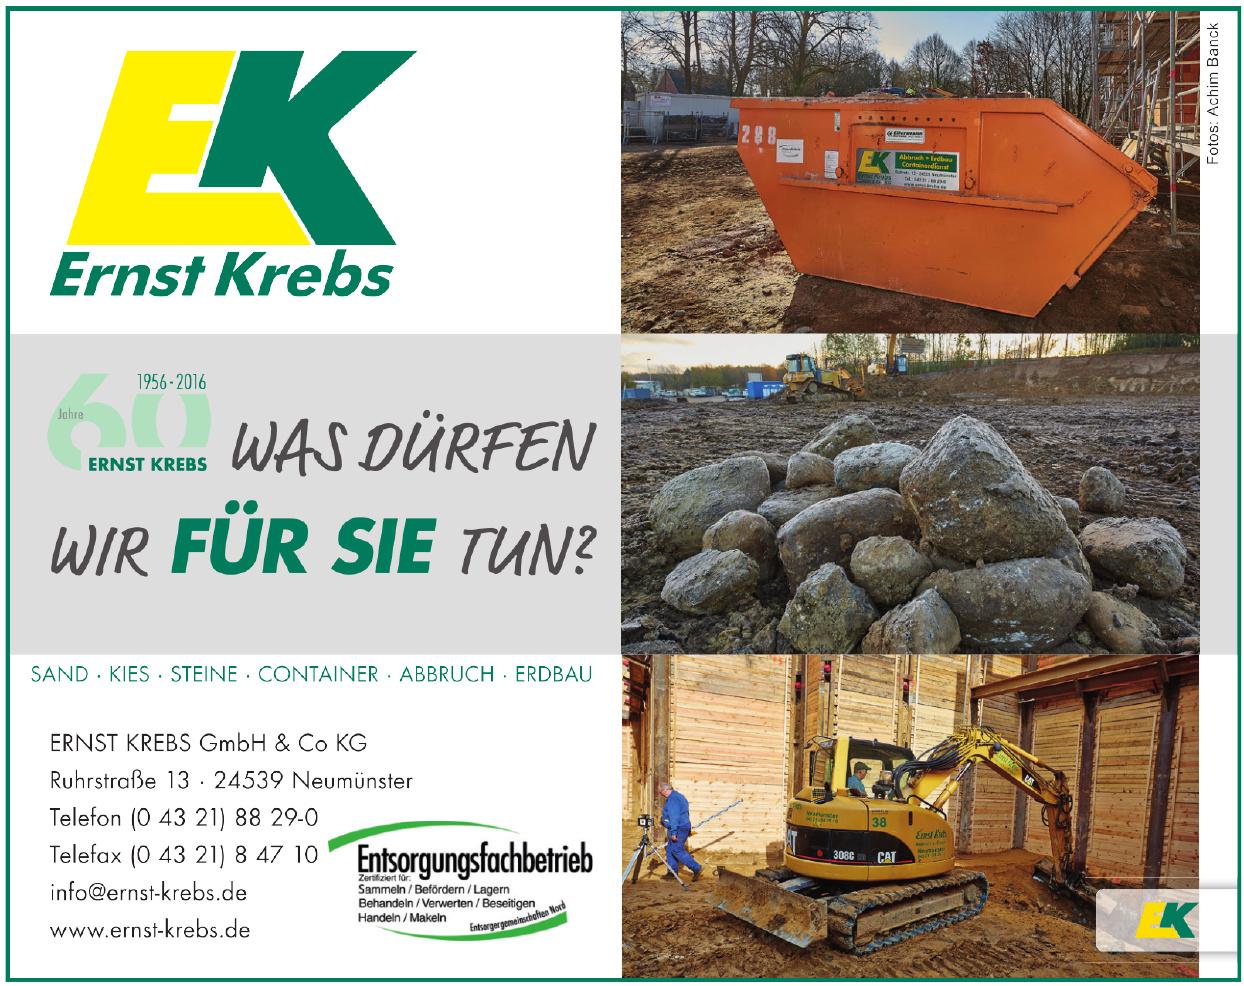 Ernst Krebs GmbH & Co. KG